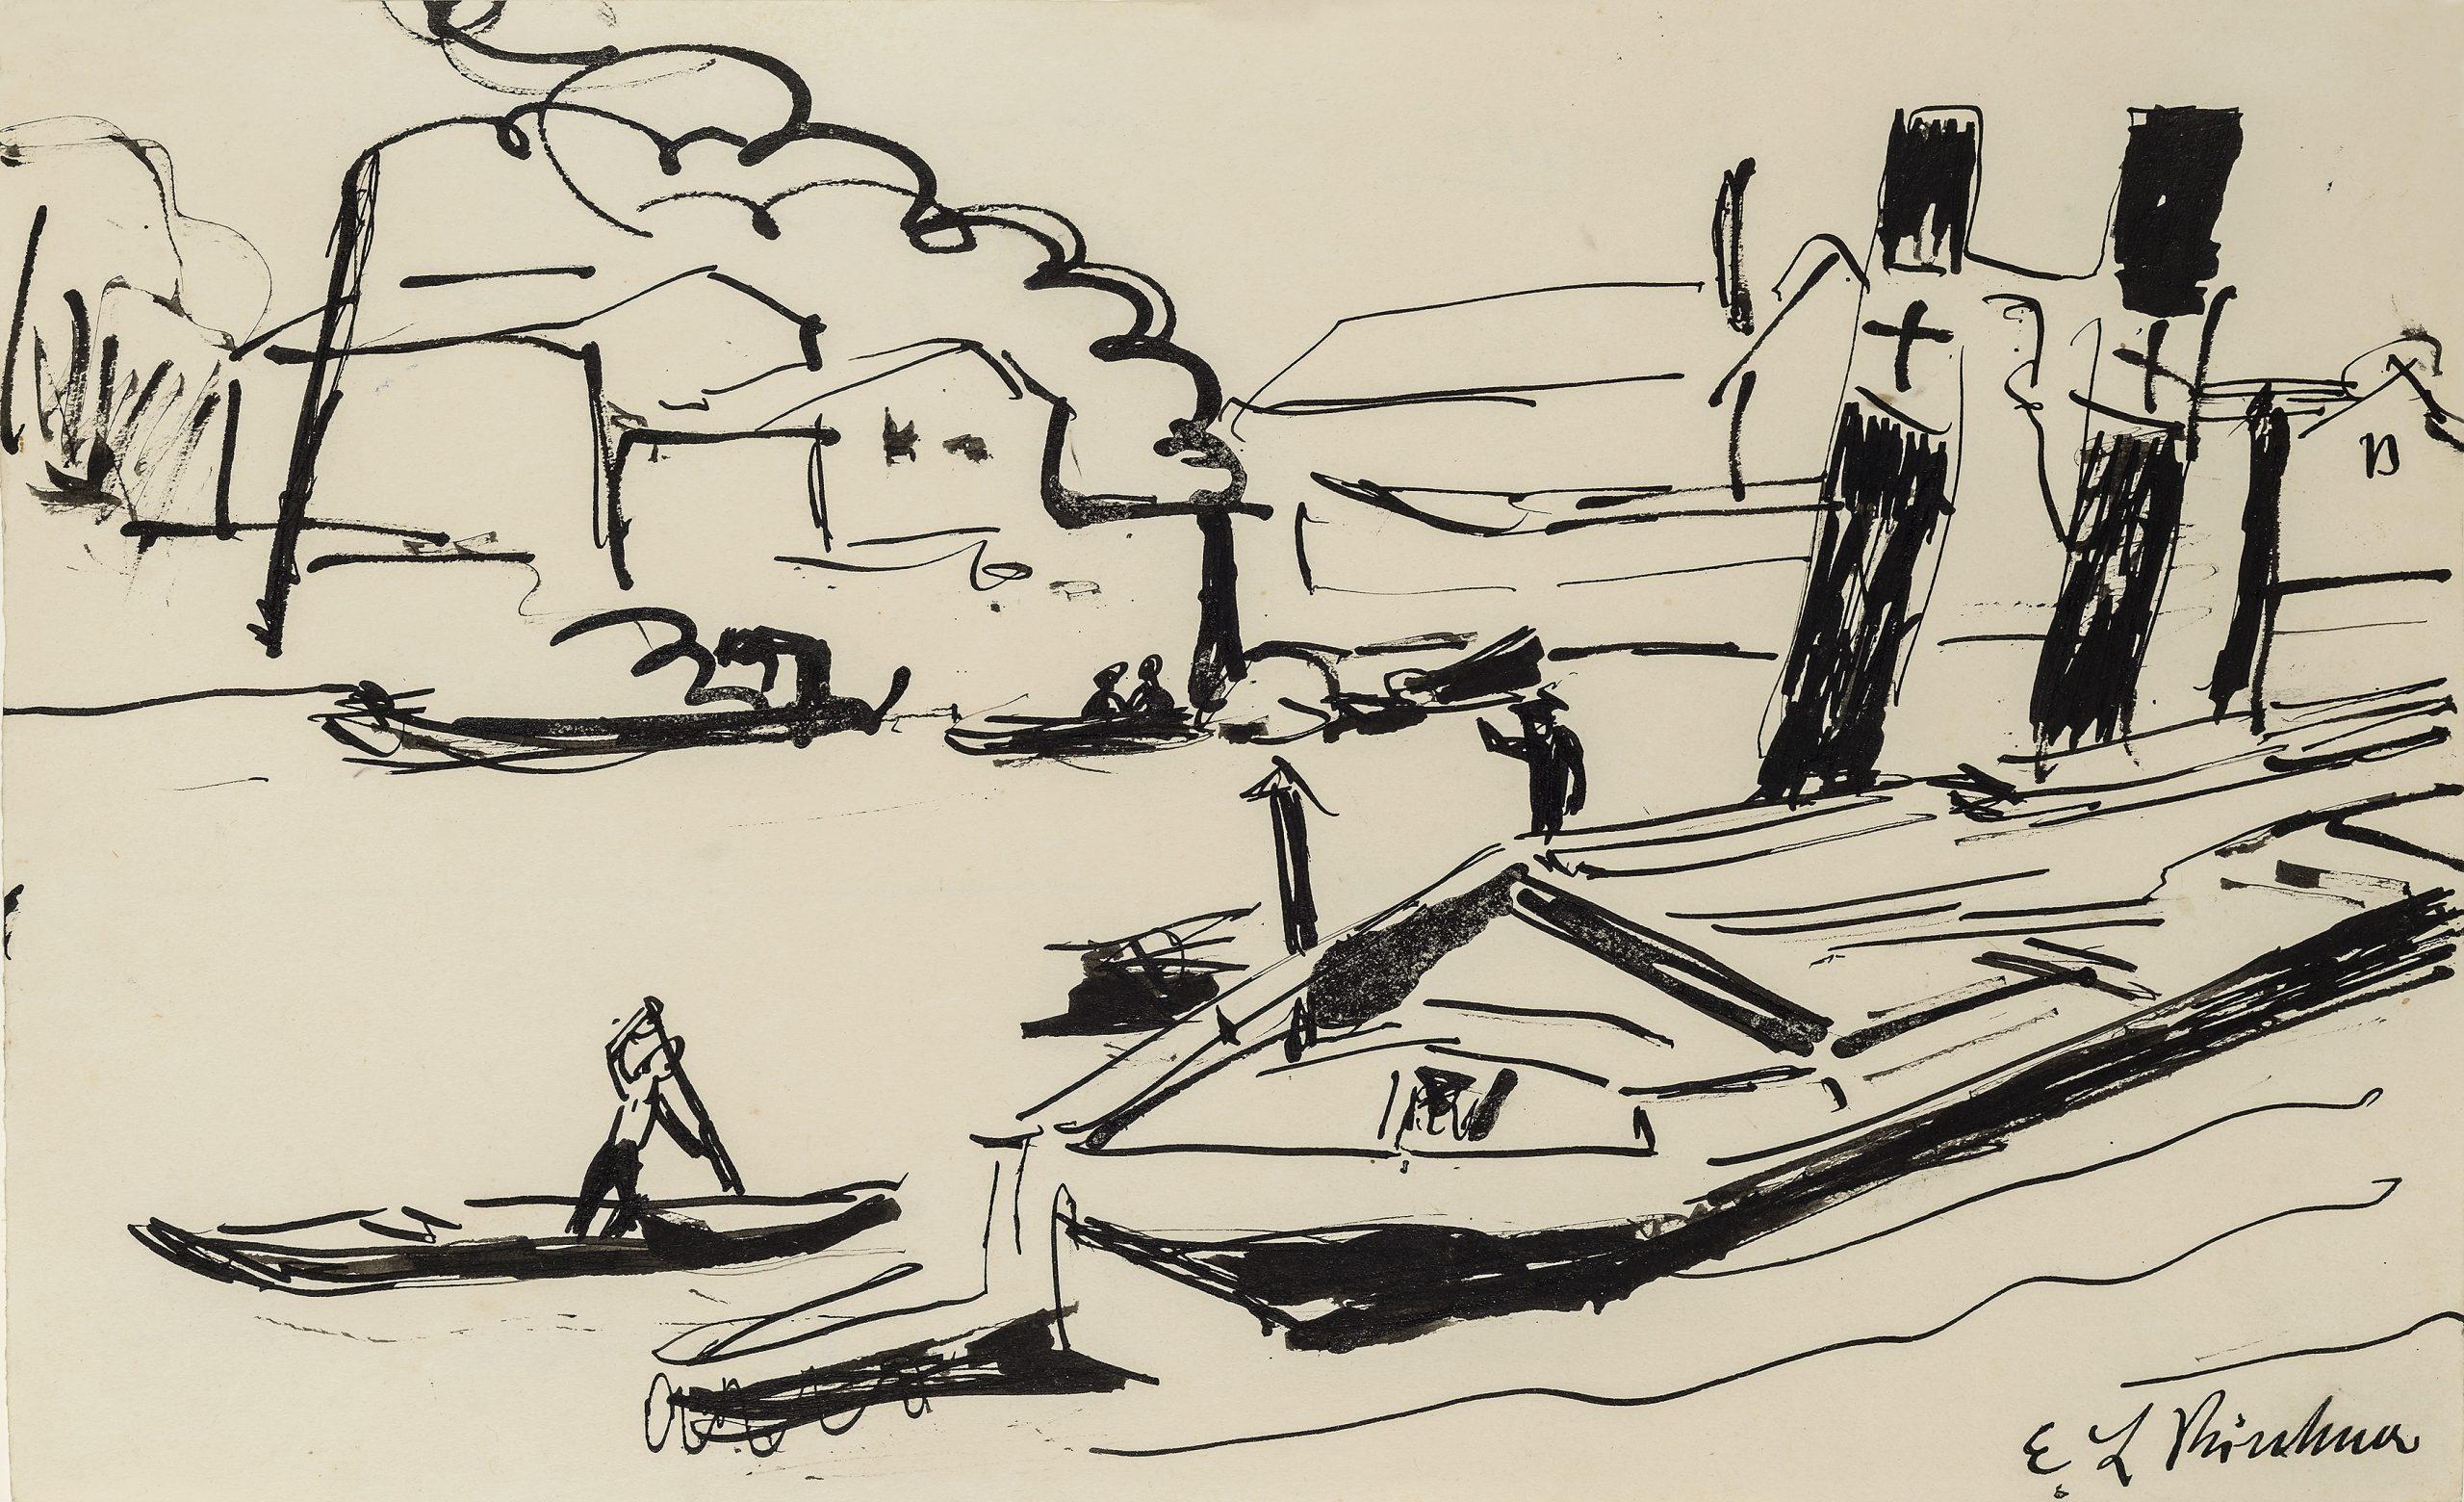 Elbdampfer – Barges by Ernst Ludwig Kirchner